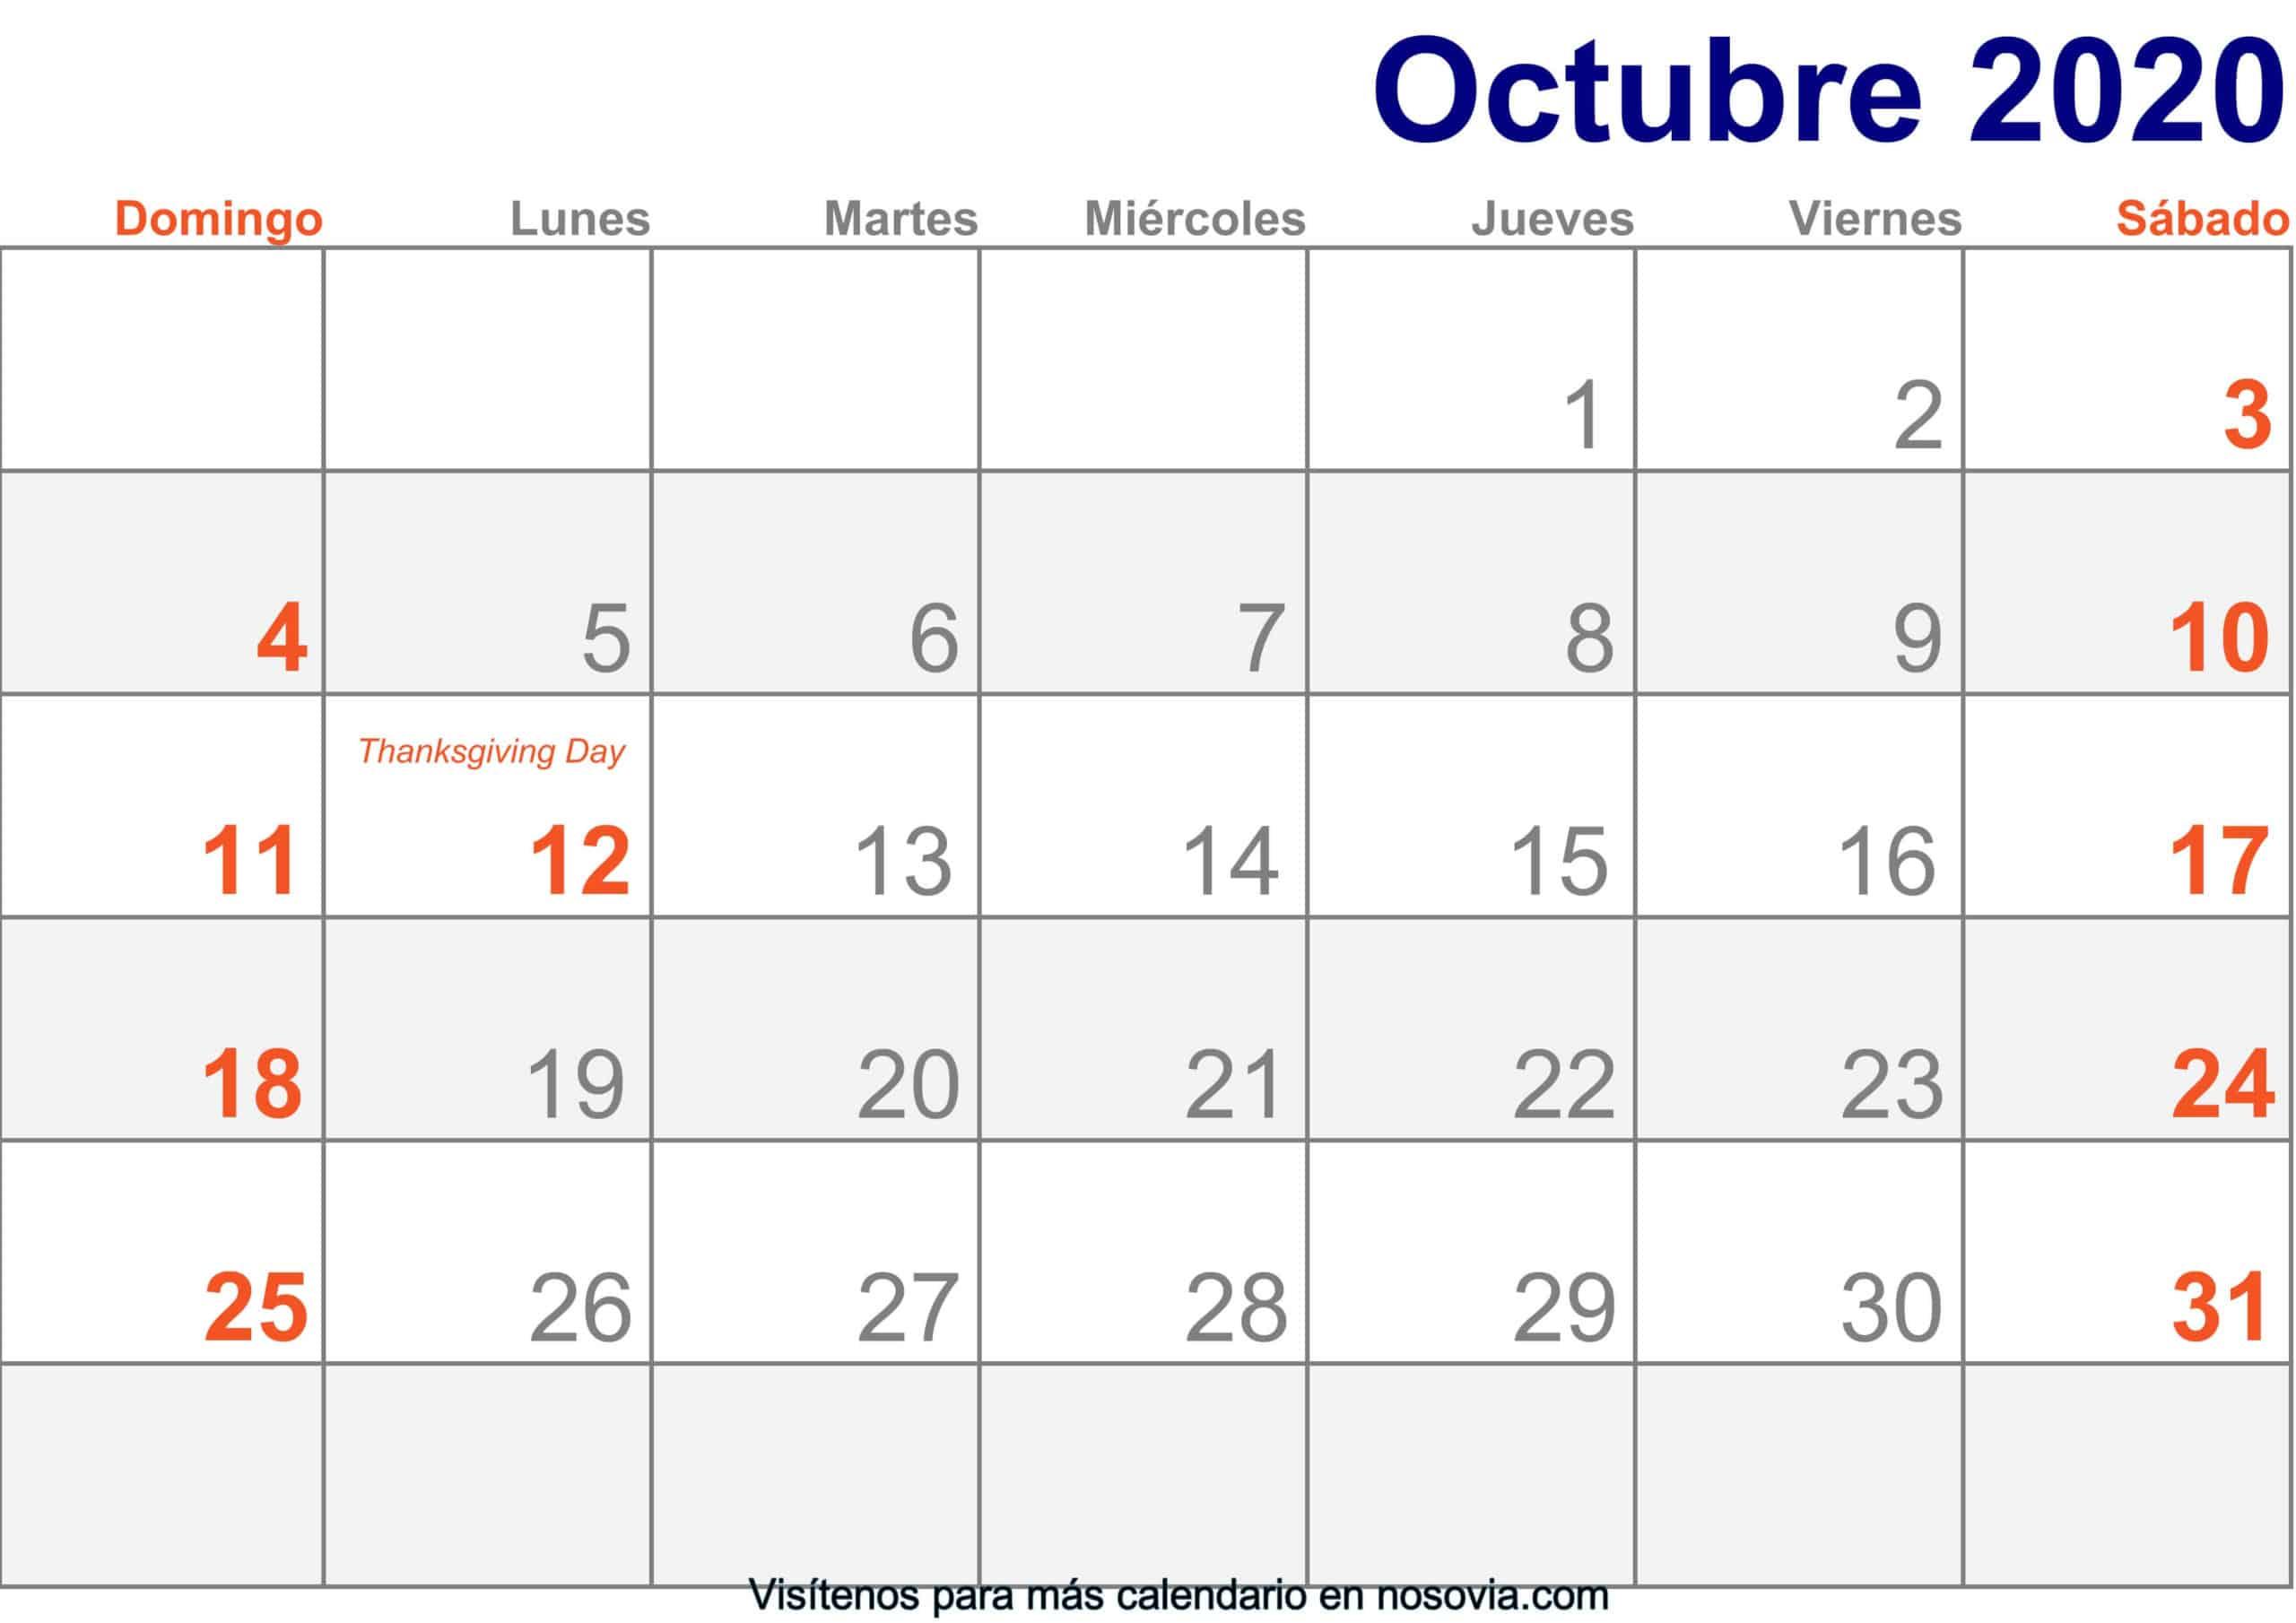 Calendario-octubre-2020-Con-Festivos-Imprimir